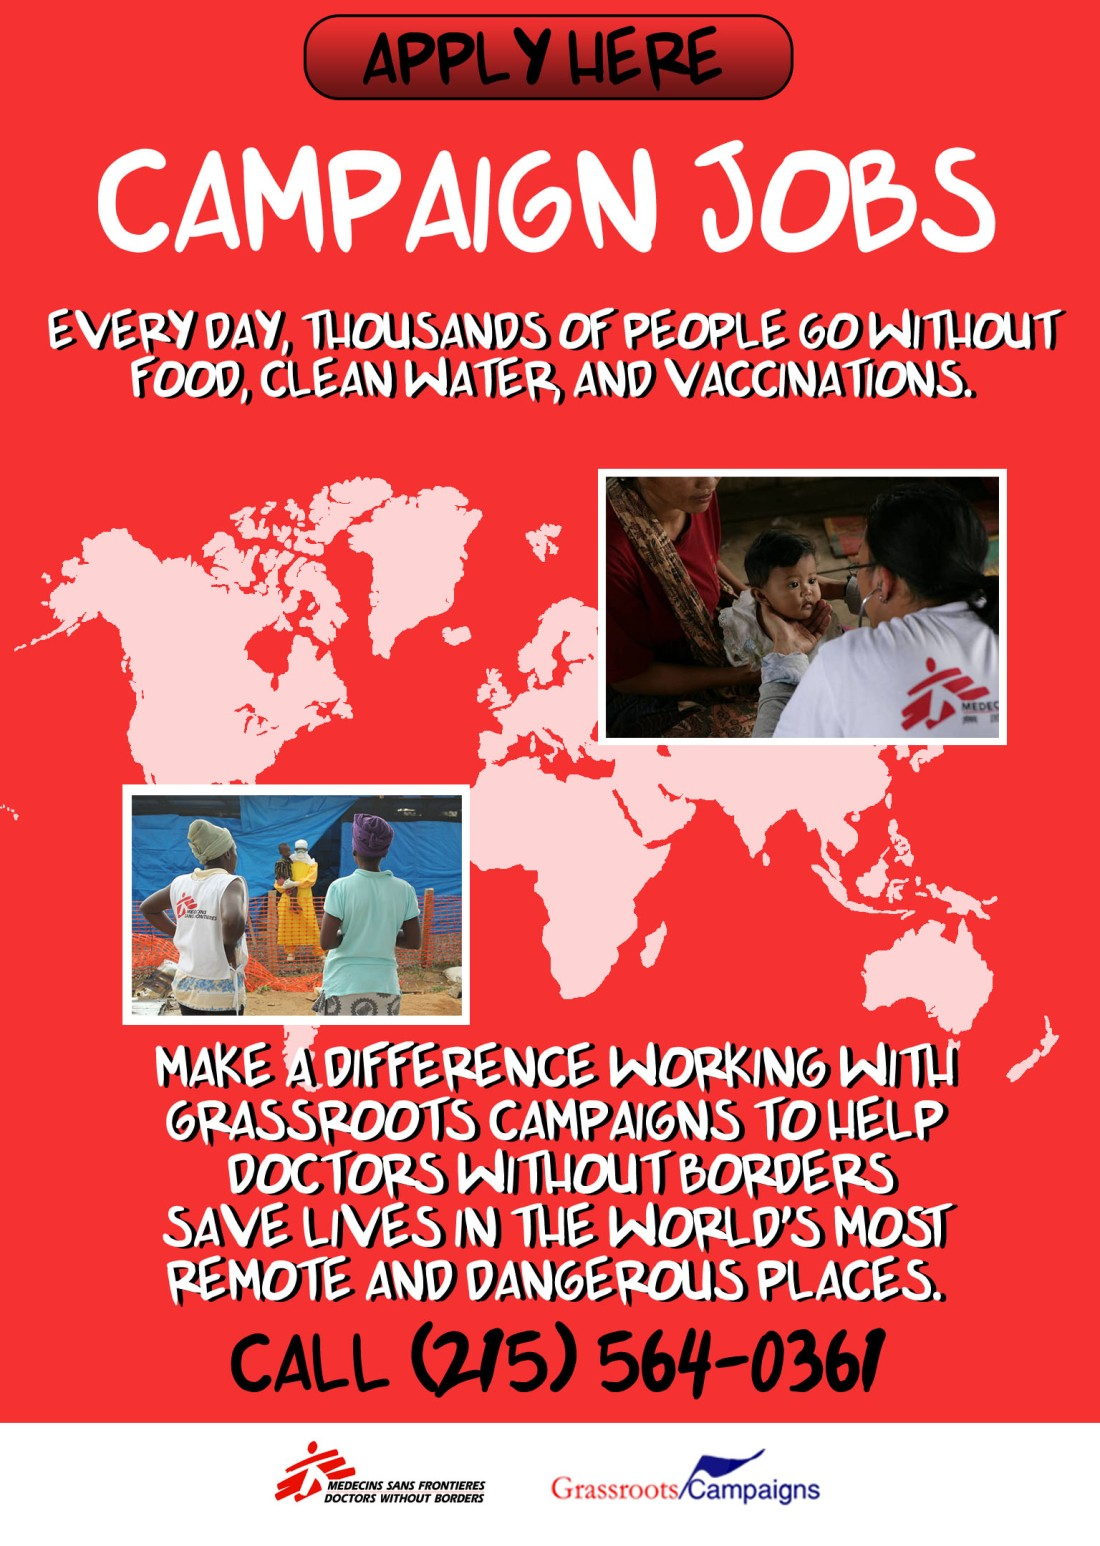 Craigslist-MSF-PHL-CampaignJobs-2015-copy